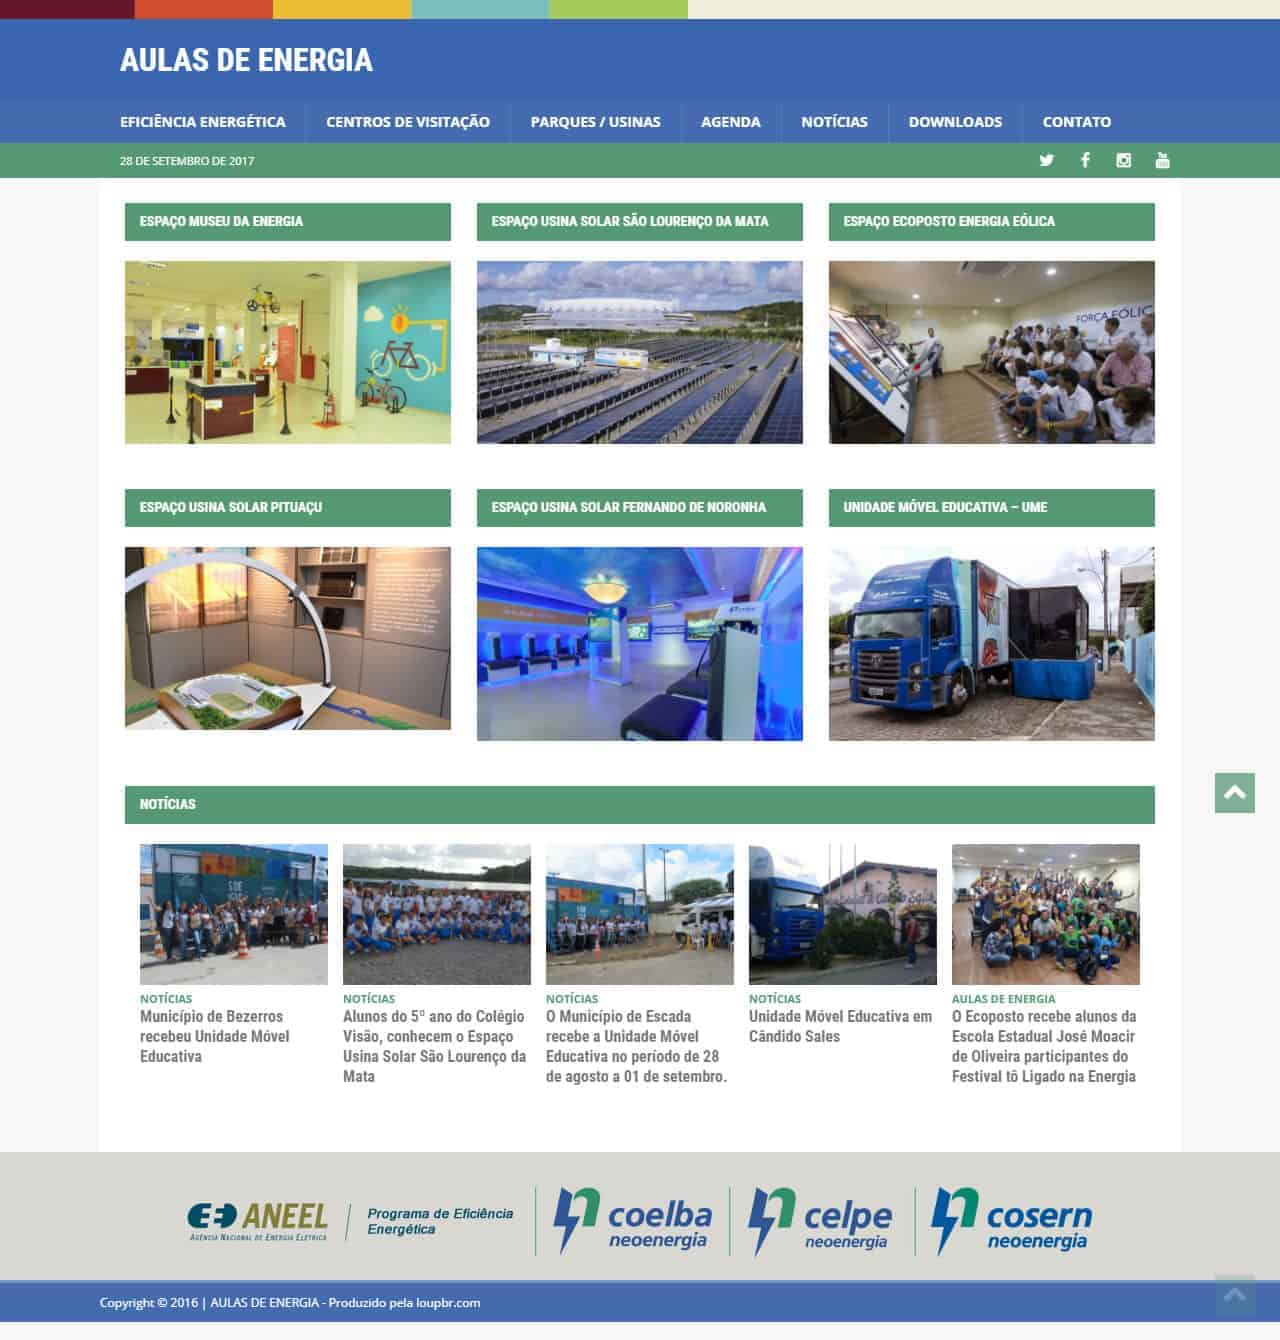 Página principal do site Aulas de Energia.